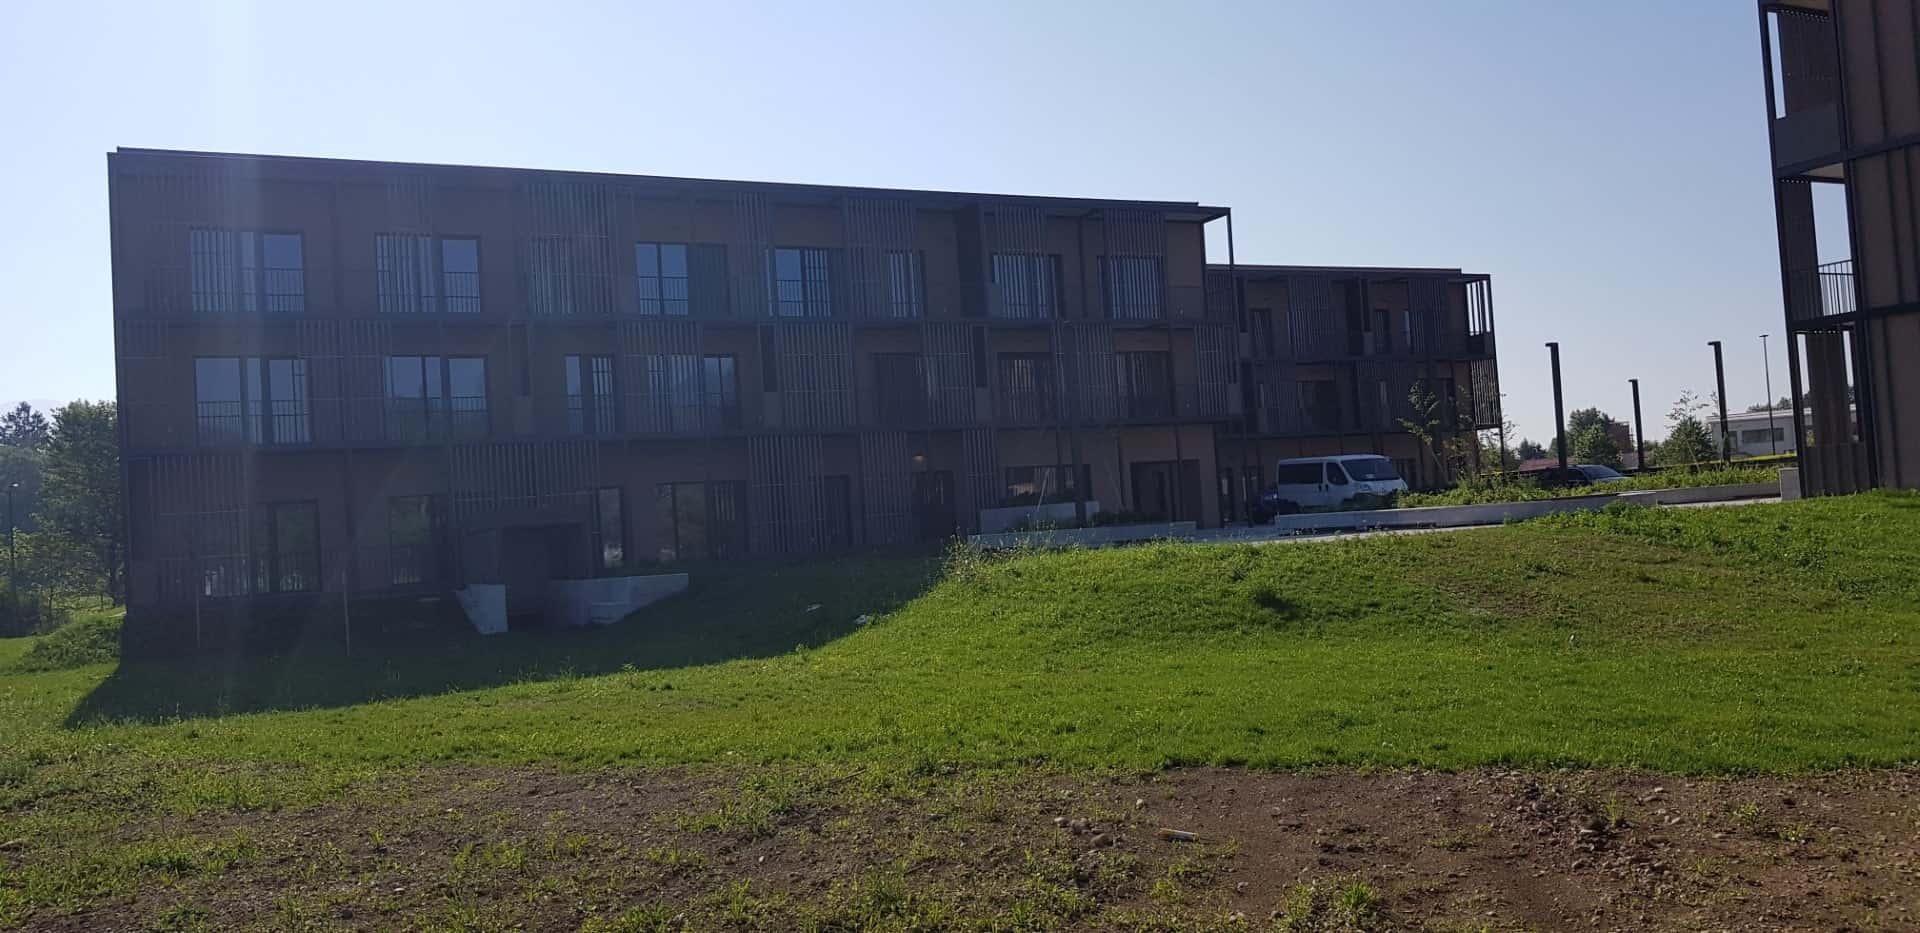 Permal doo reference Varovana stanovanja bled -2 2019 iMode d.o.o. (Large)